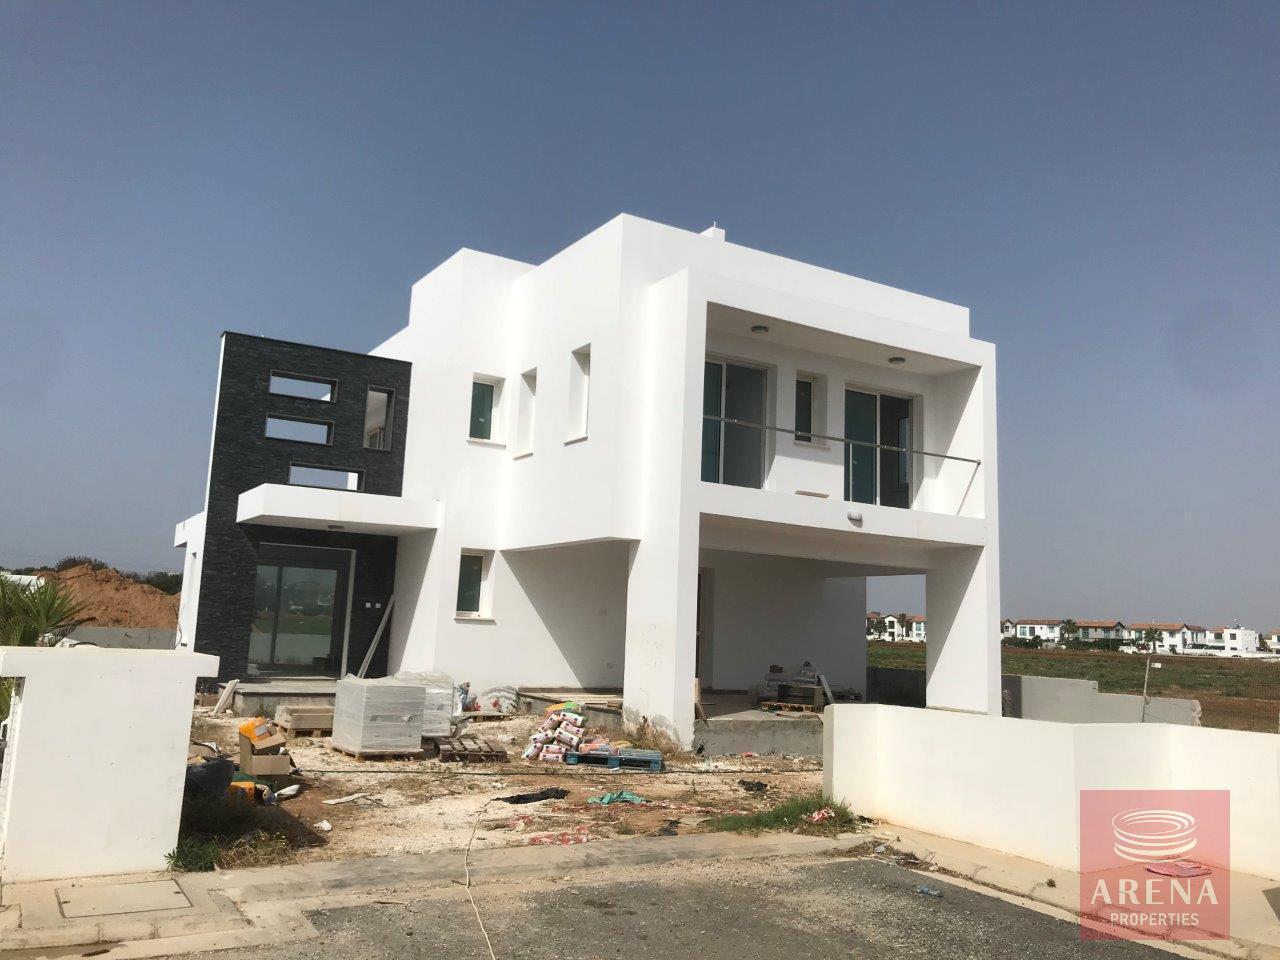 Villa in Ayia Triada new